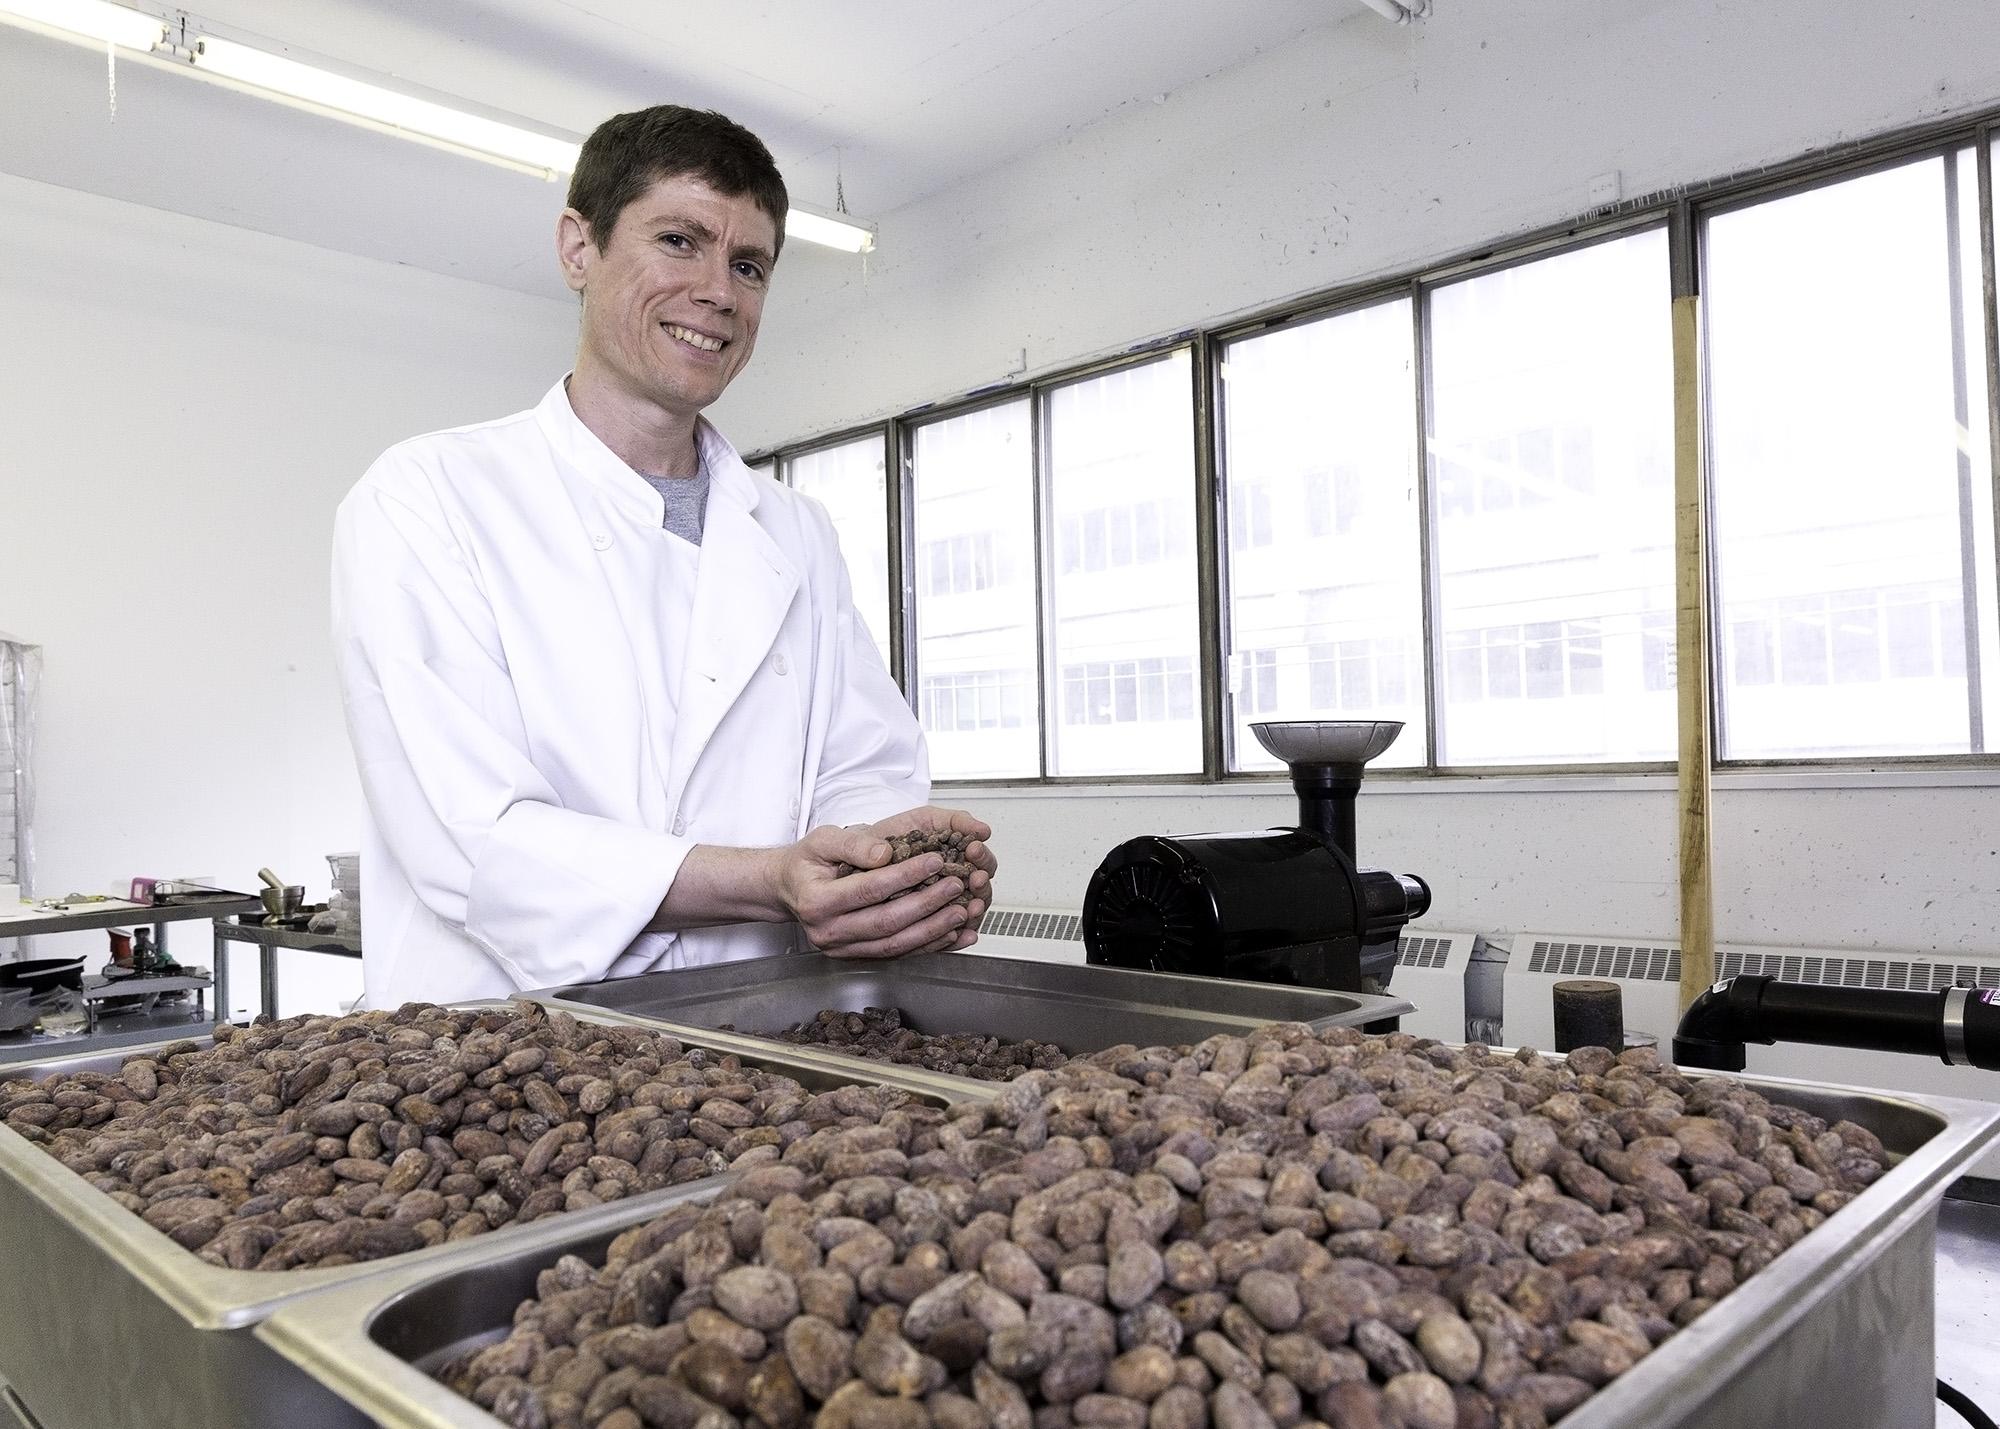 Daniel Haran, founder, Chocolats Monarque. Photo by Carla Oliveira.